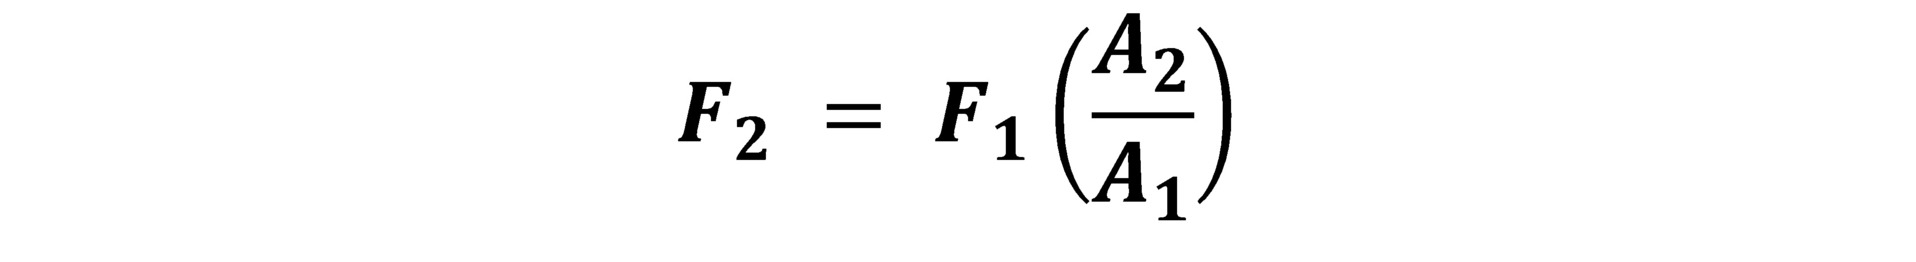 فرمول اصل پاسکال چبست؟